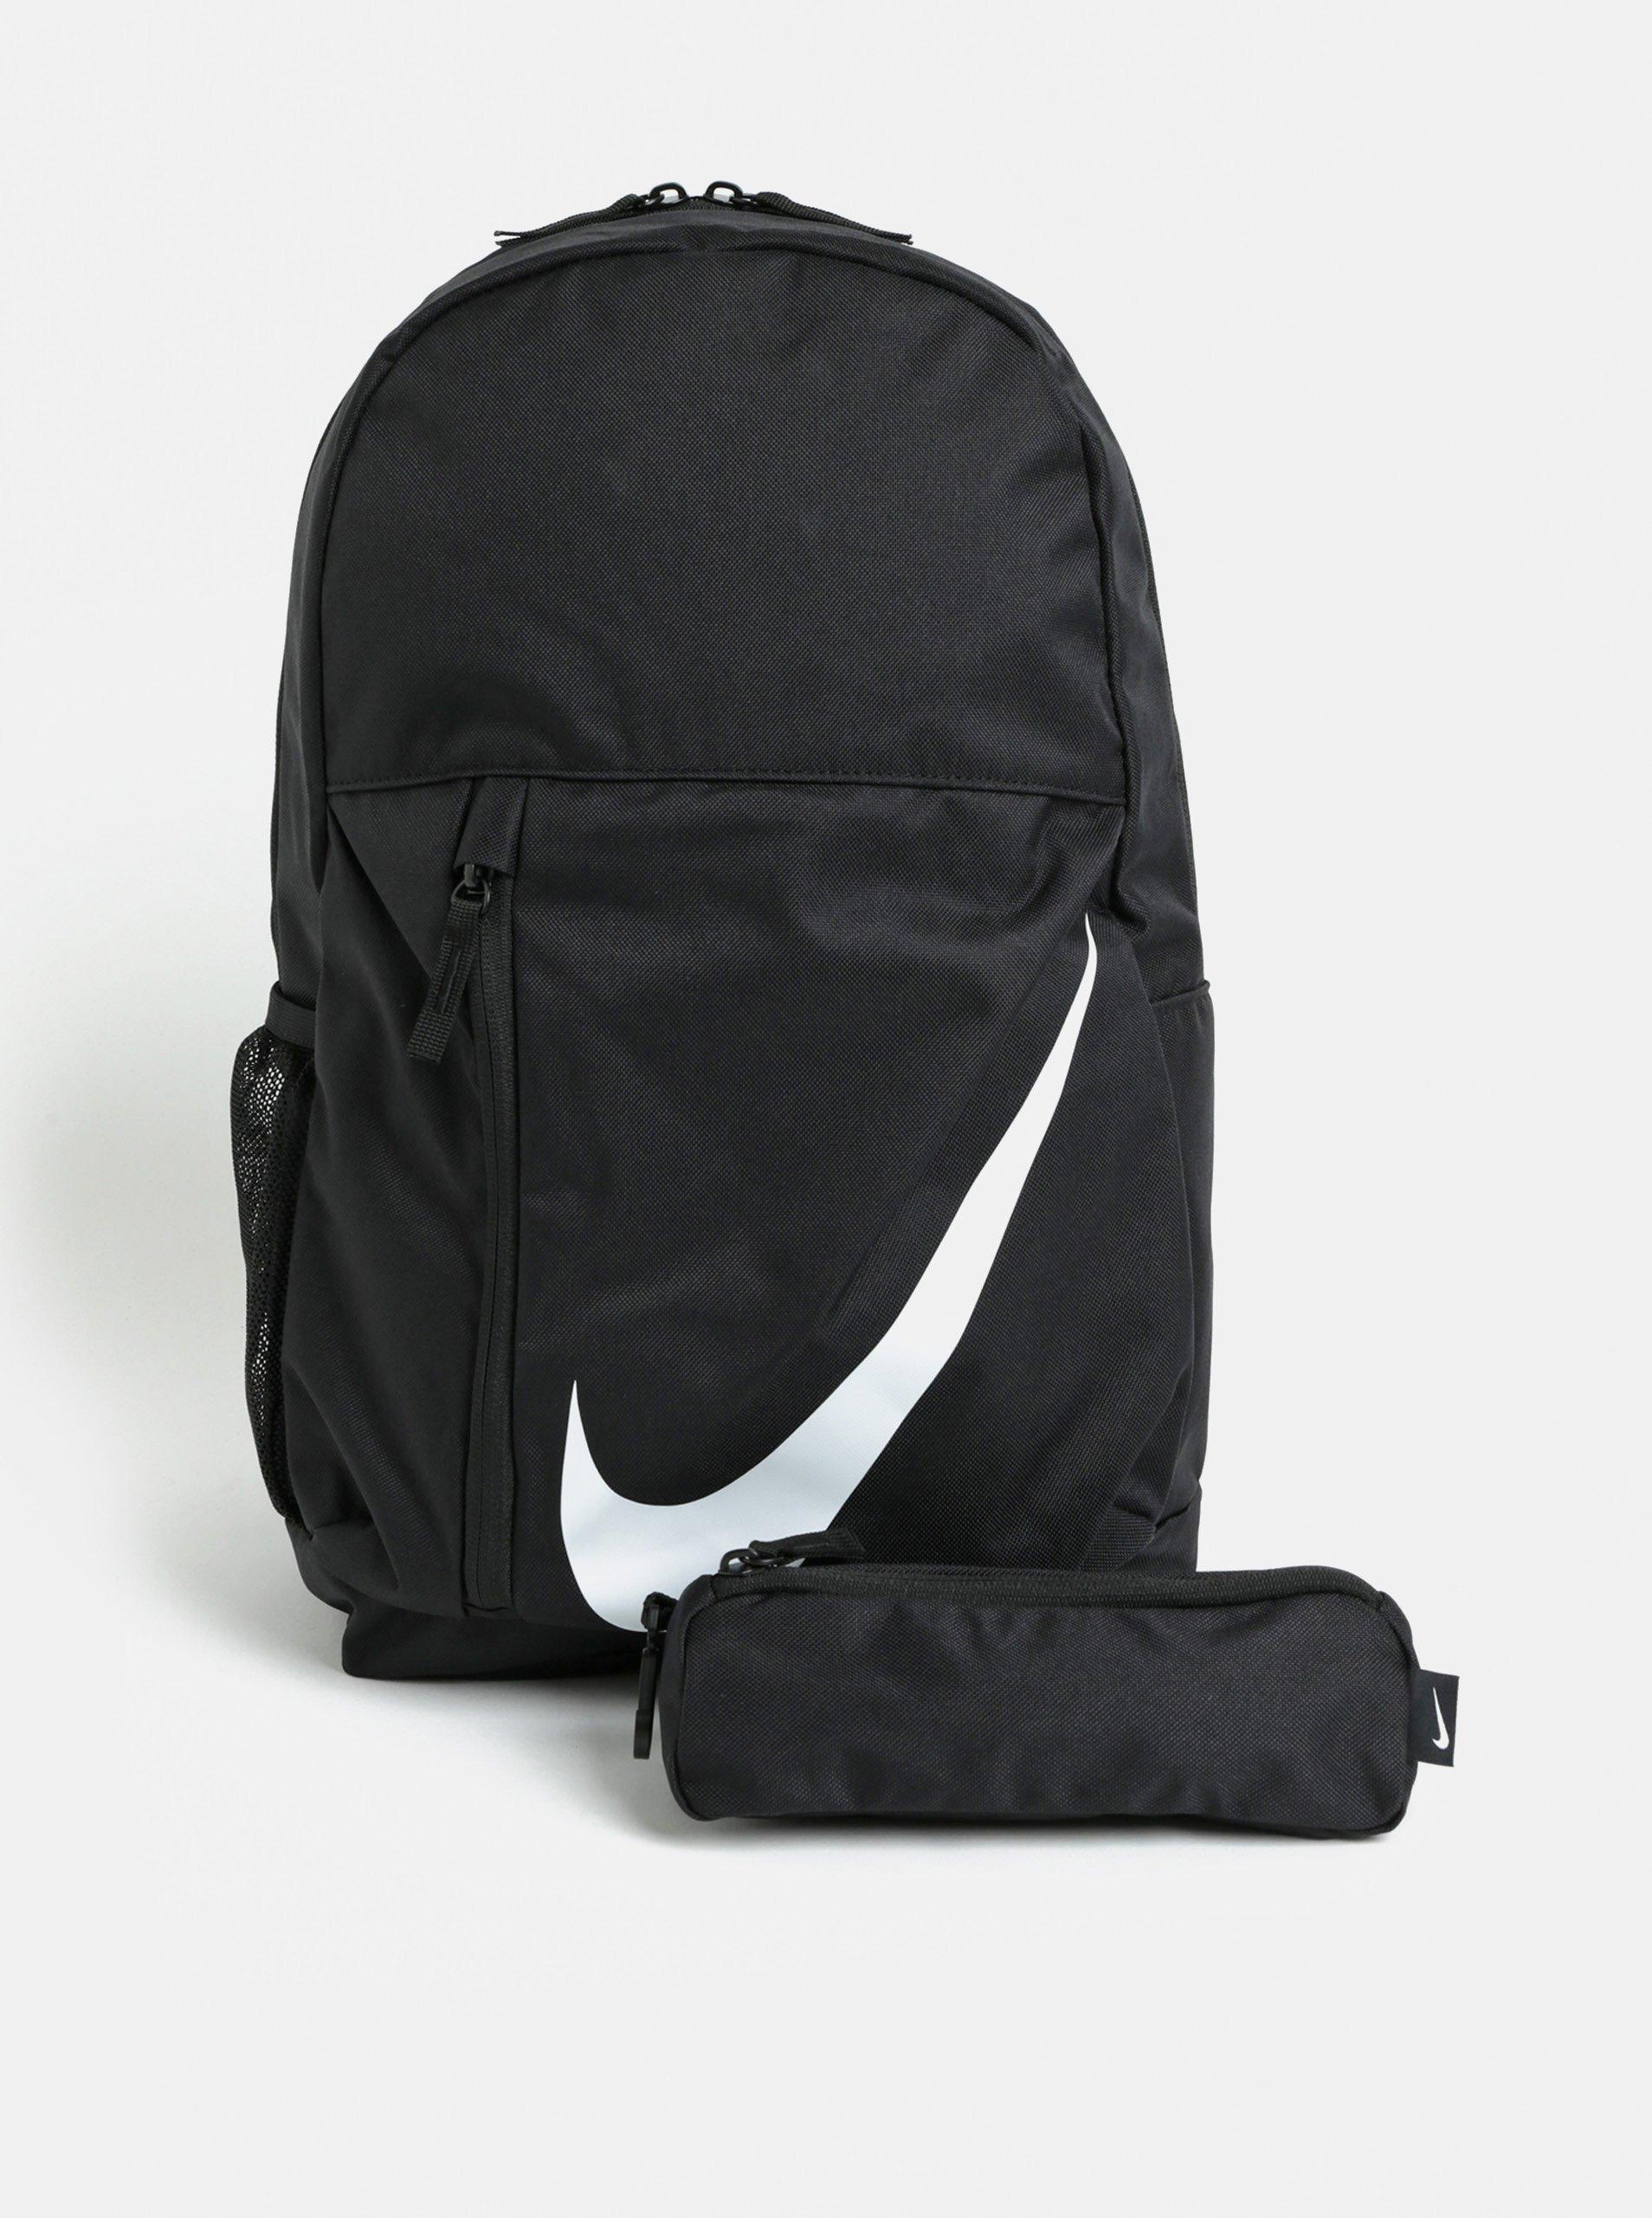 Černý batoh s penálem Nike Elemental 22 l